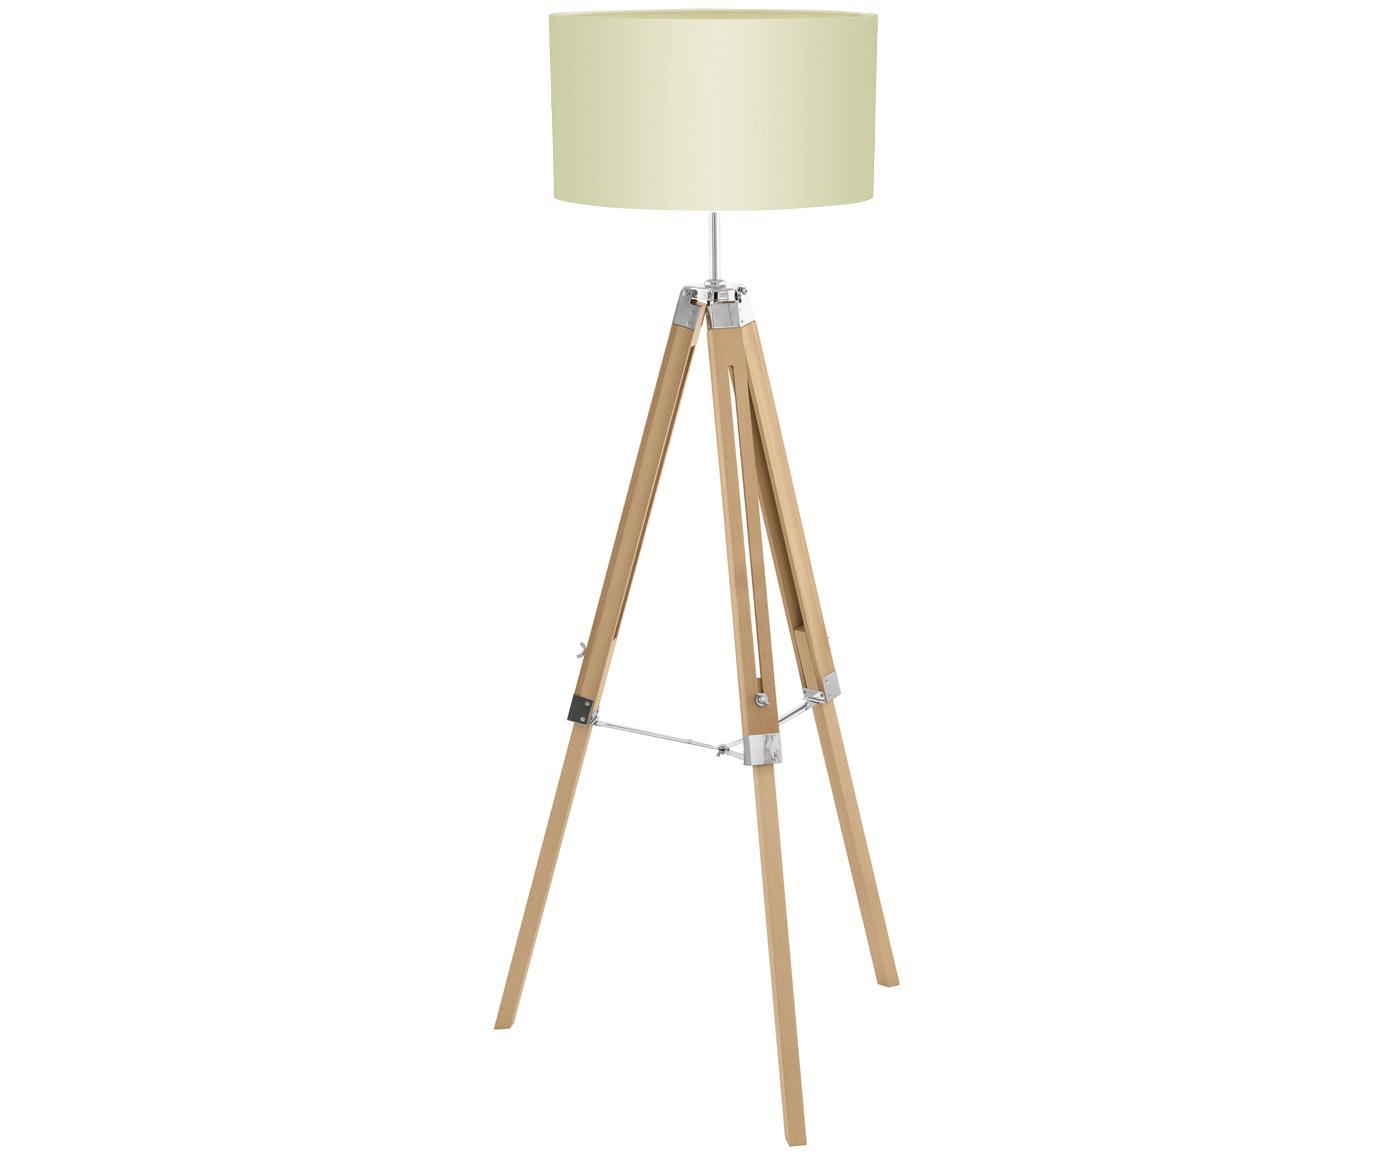 Lámpara de pie Lantada, altura regulable, Pantalla: poliéster, Crema, marrón, Ø 70 x Al 150 cm